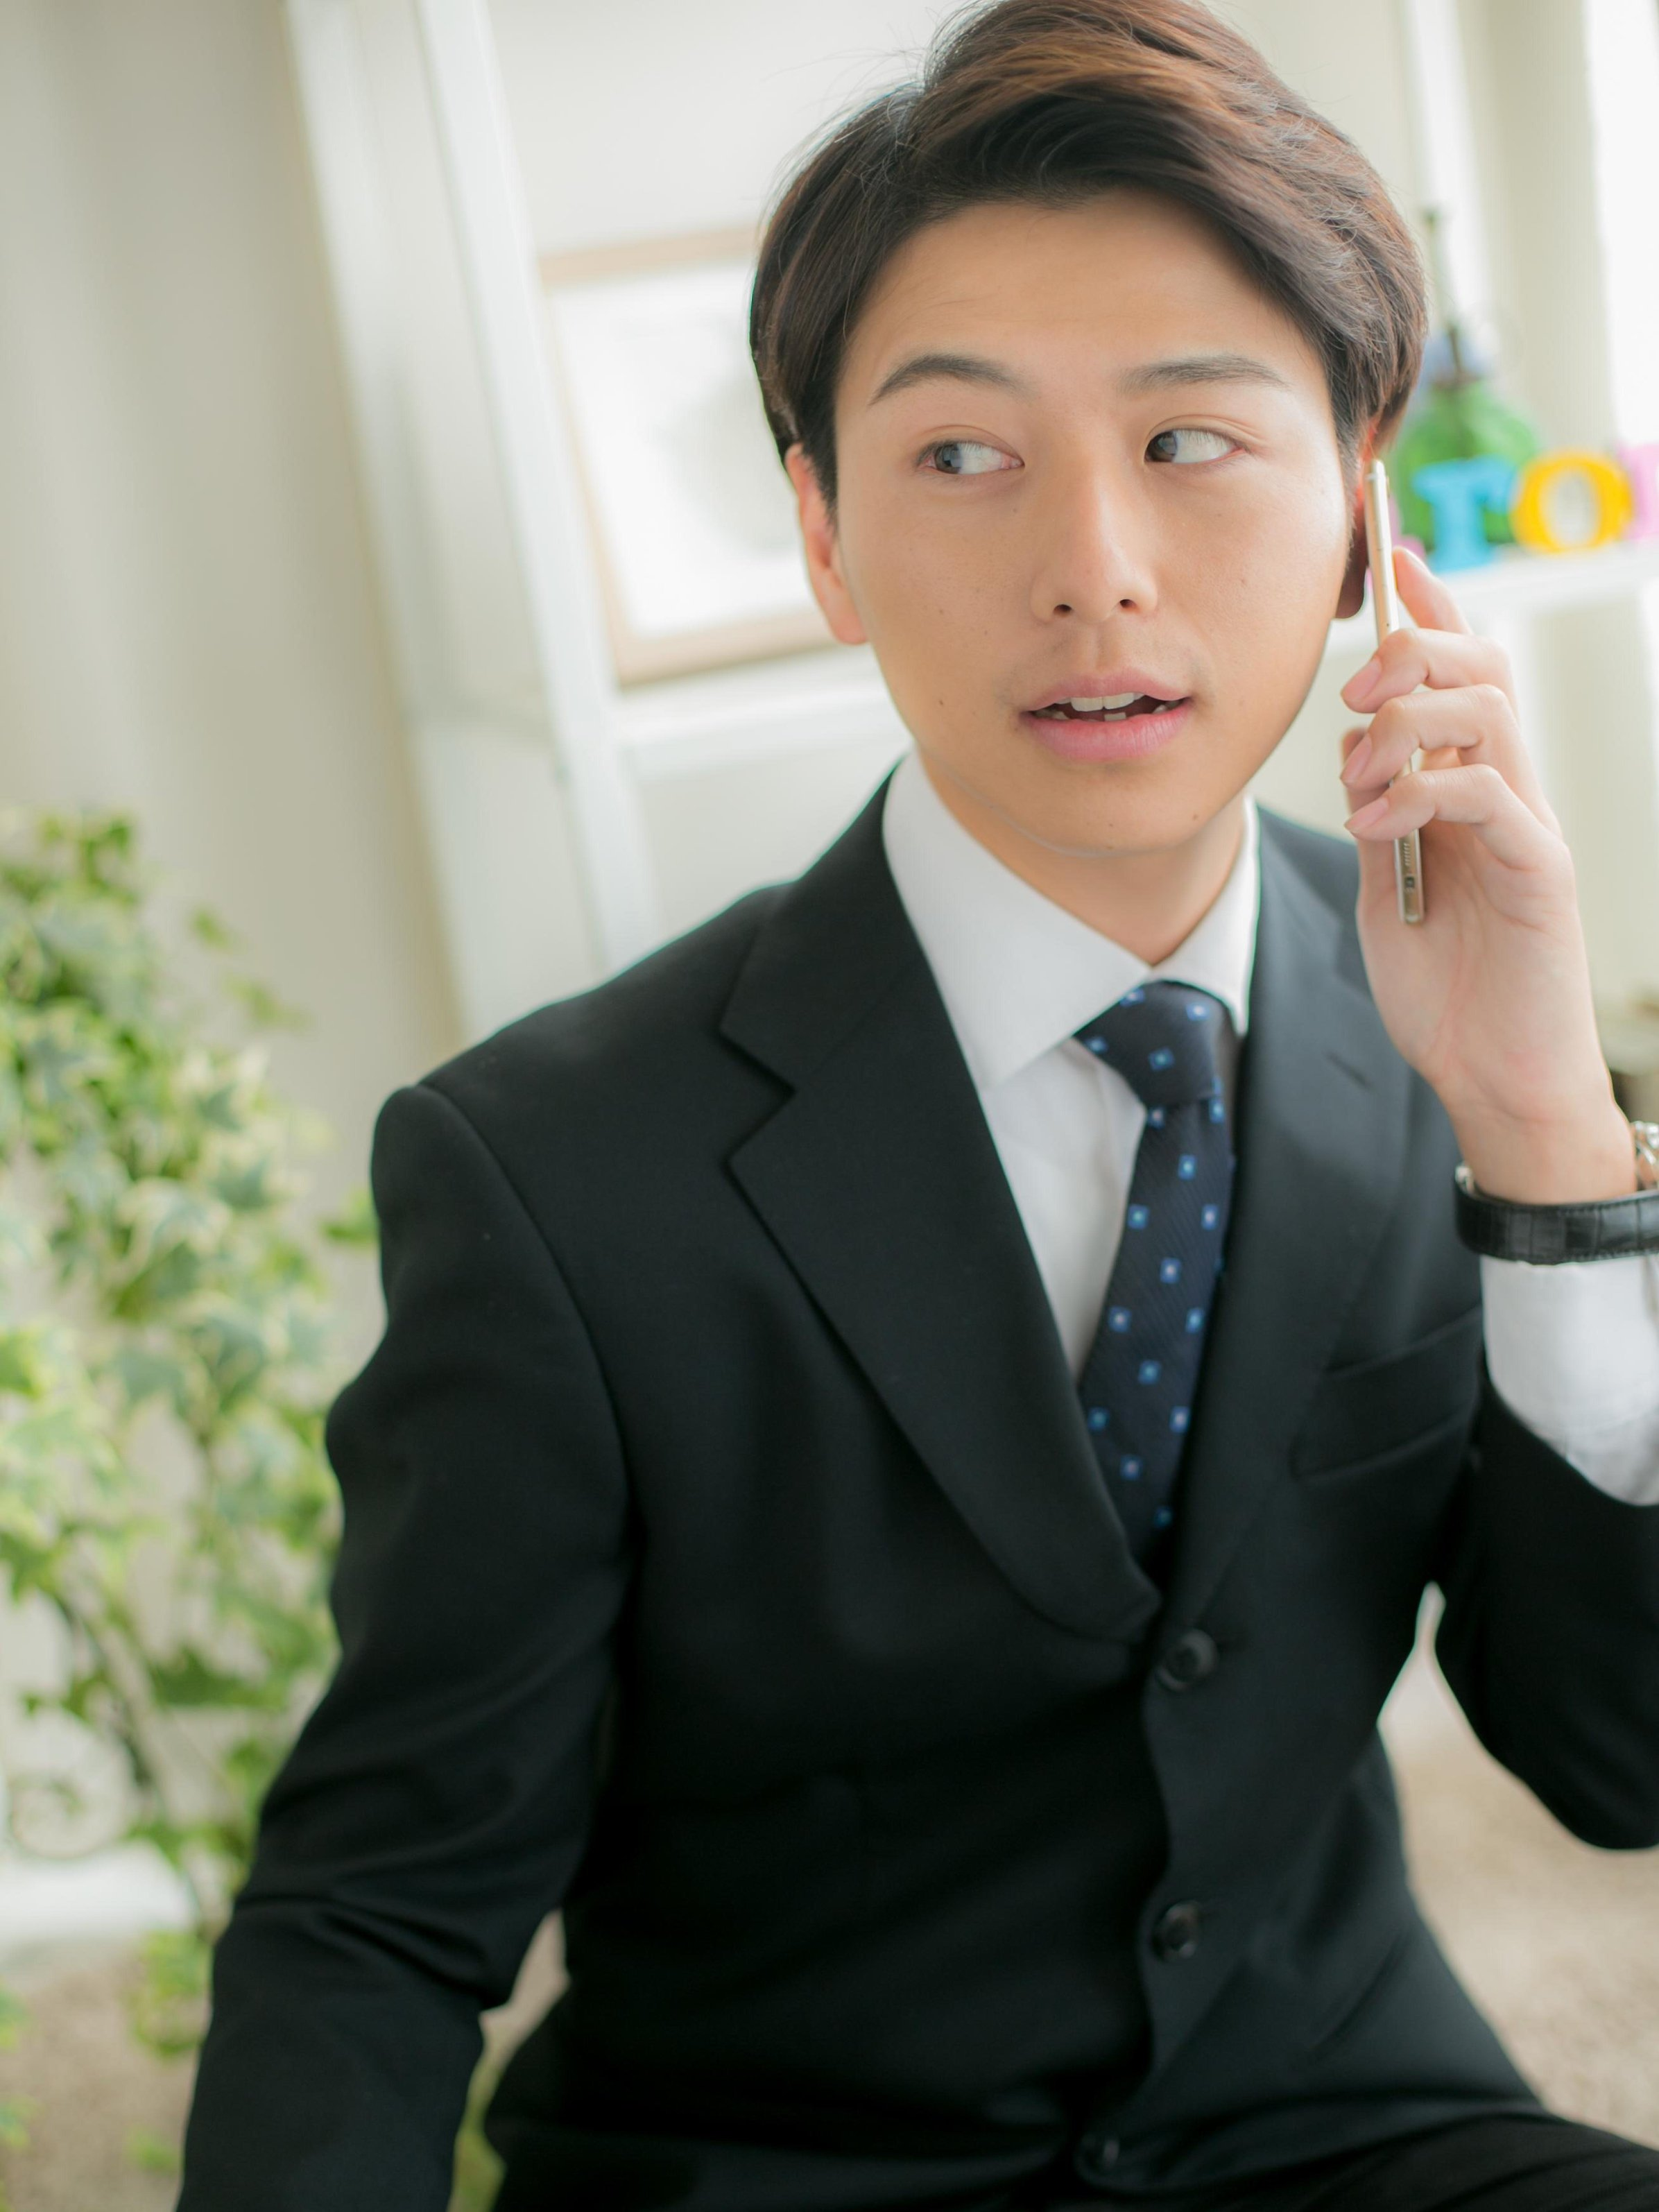 【macaron】好感度☆バツグン!スーツ男子へ贈る7:3スタイル